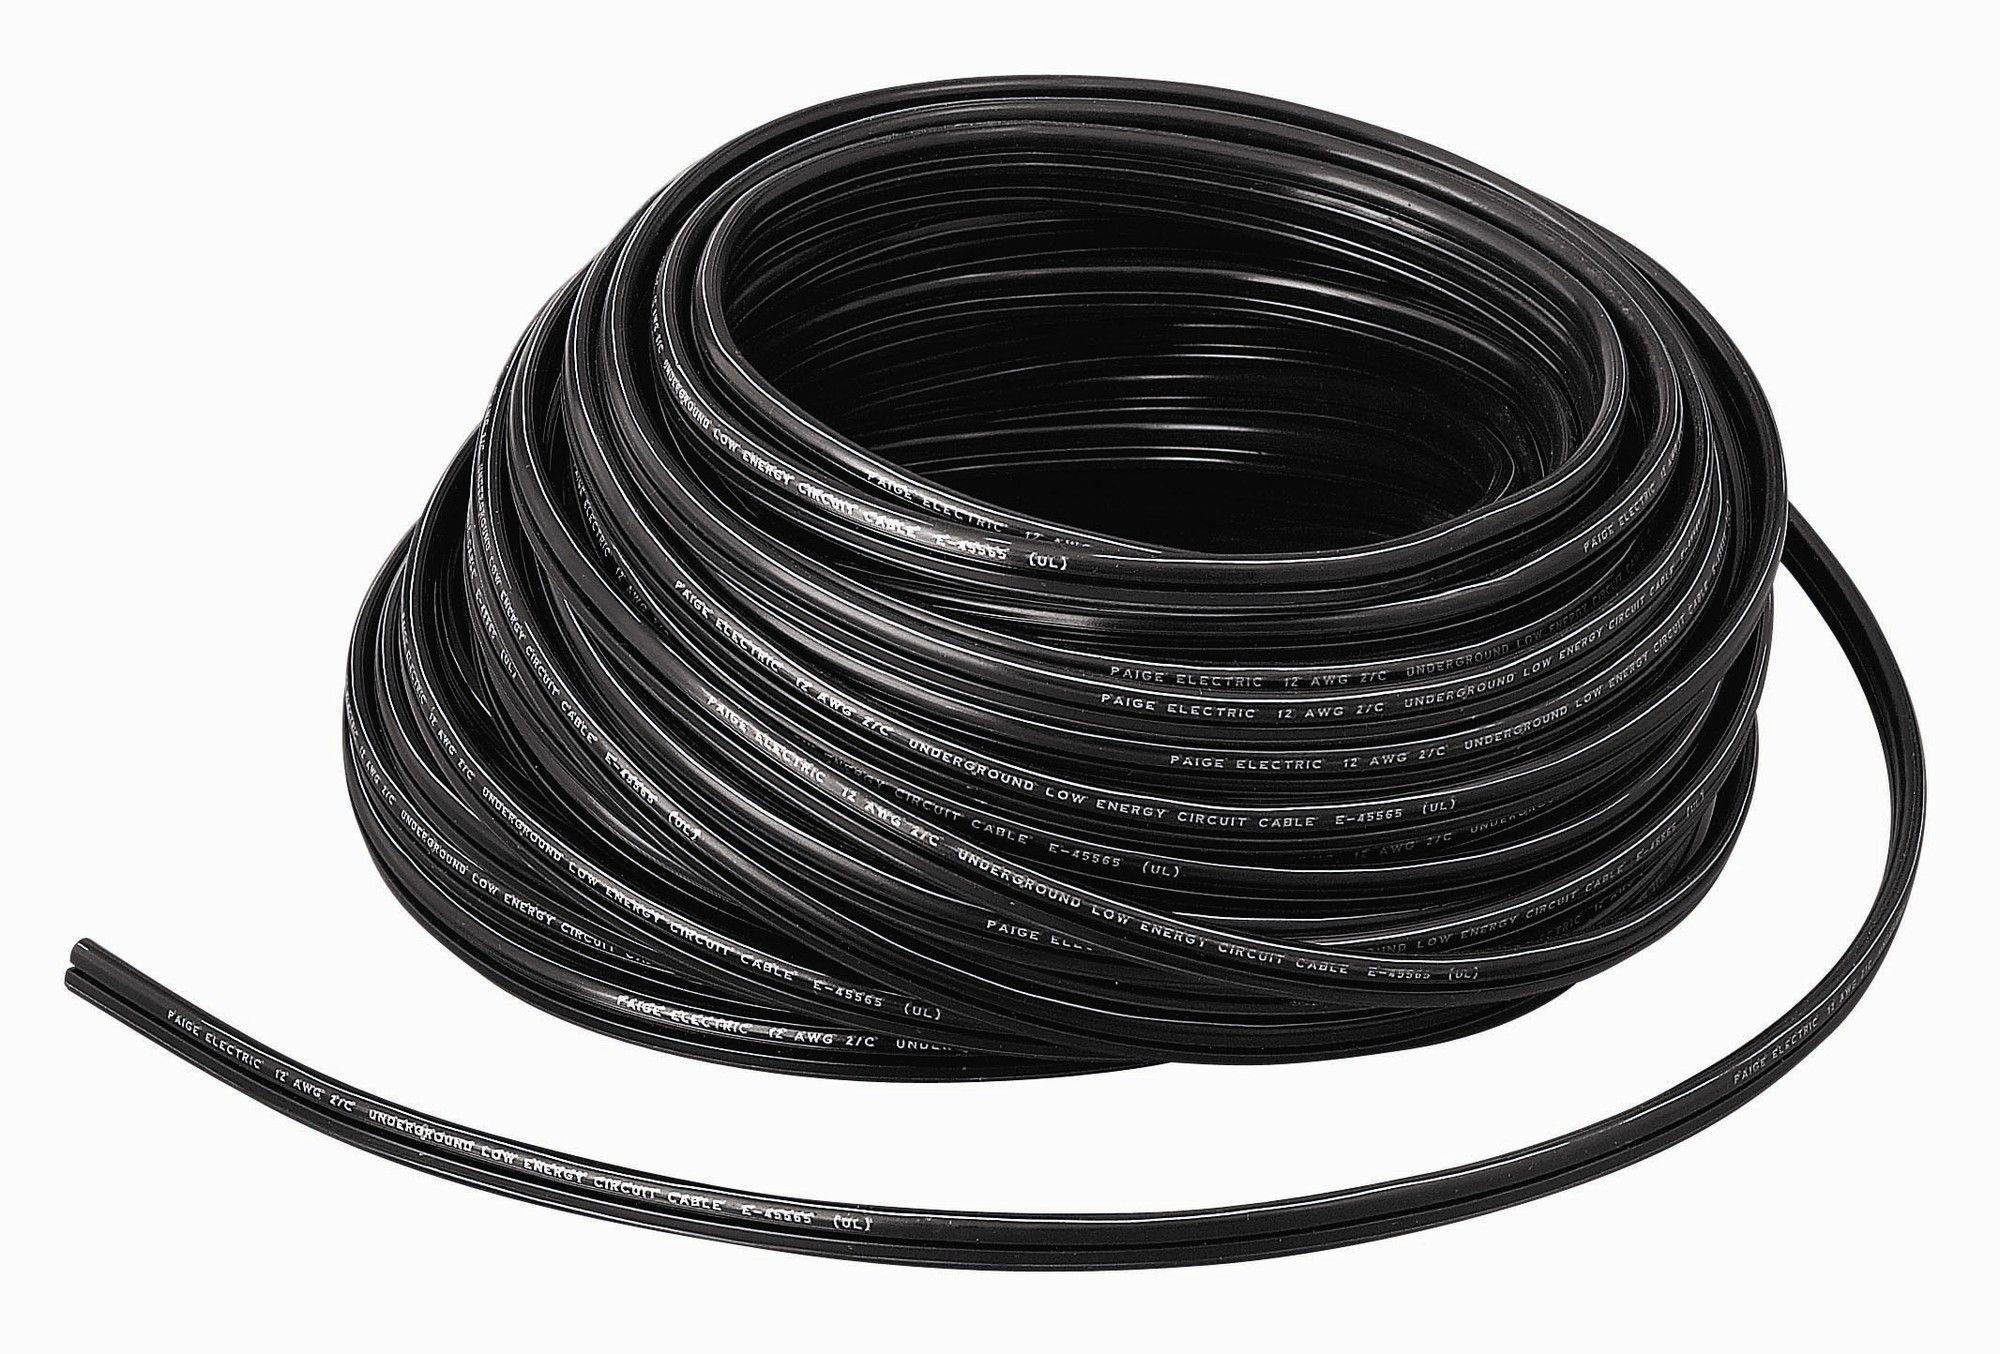 medium resolution of wire 12 gauge 100 feet wire spool electrical supplies outdoor lighting landscape lighting